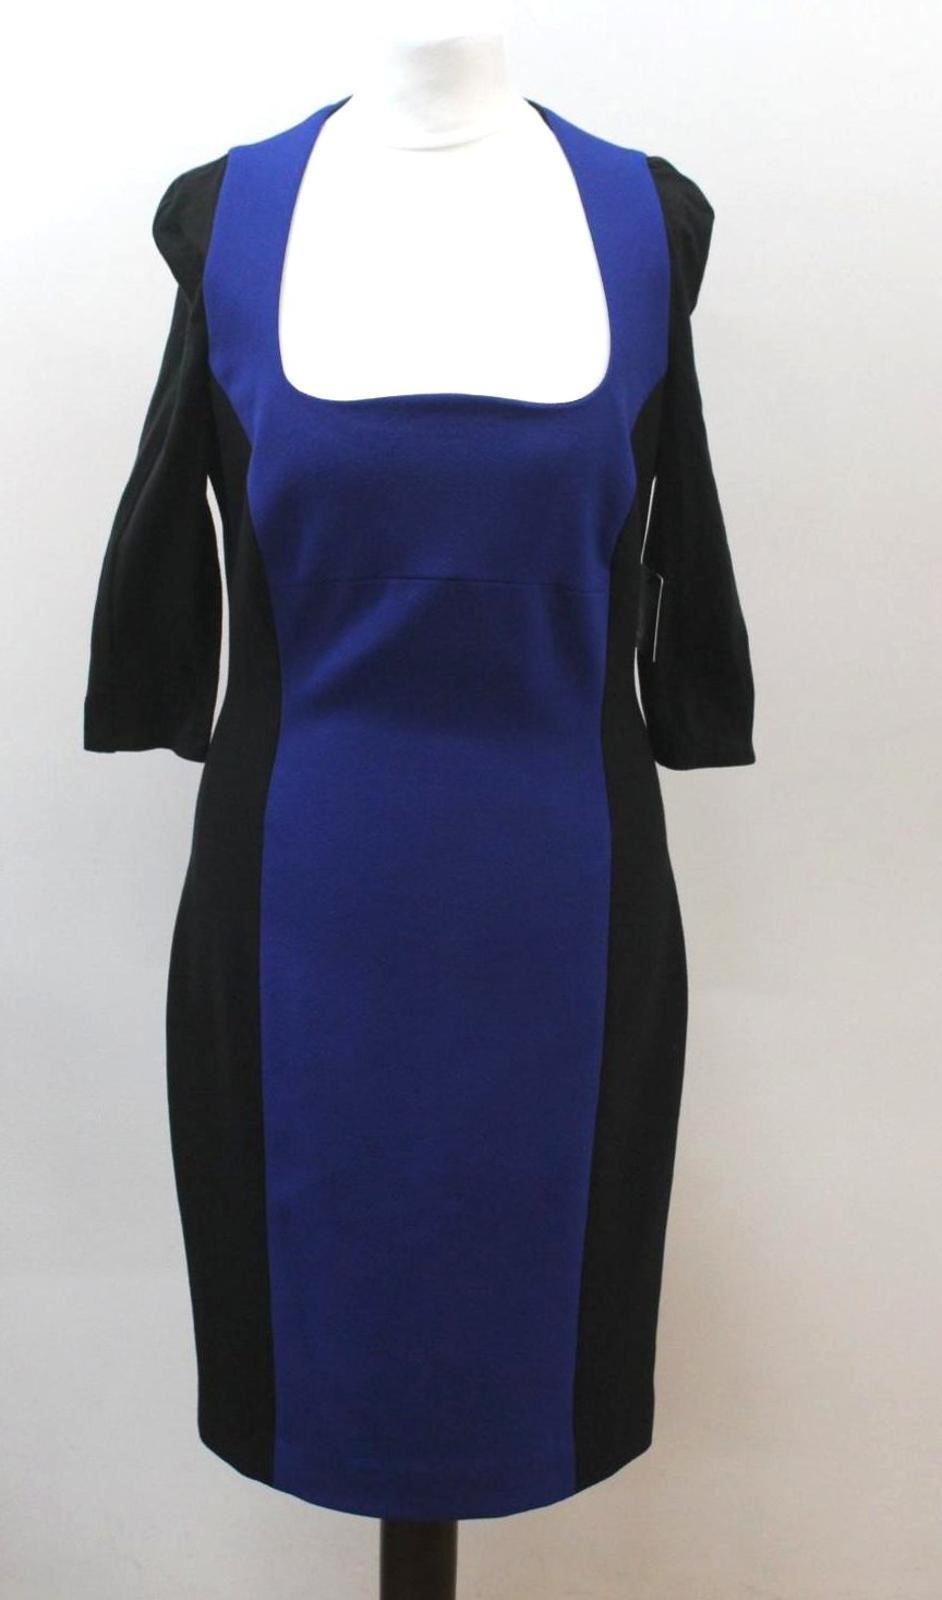 CABE Ladies schwarz Blau 3 4 Sleeve Scoop Neckline Pencil Dress US6 UK10 BNWT